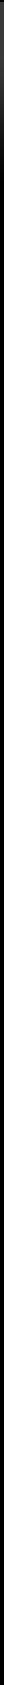 black_background_repeat11.jpg